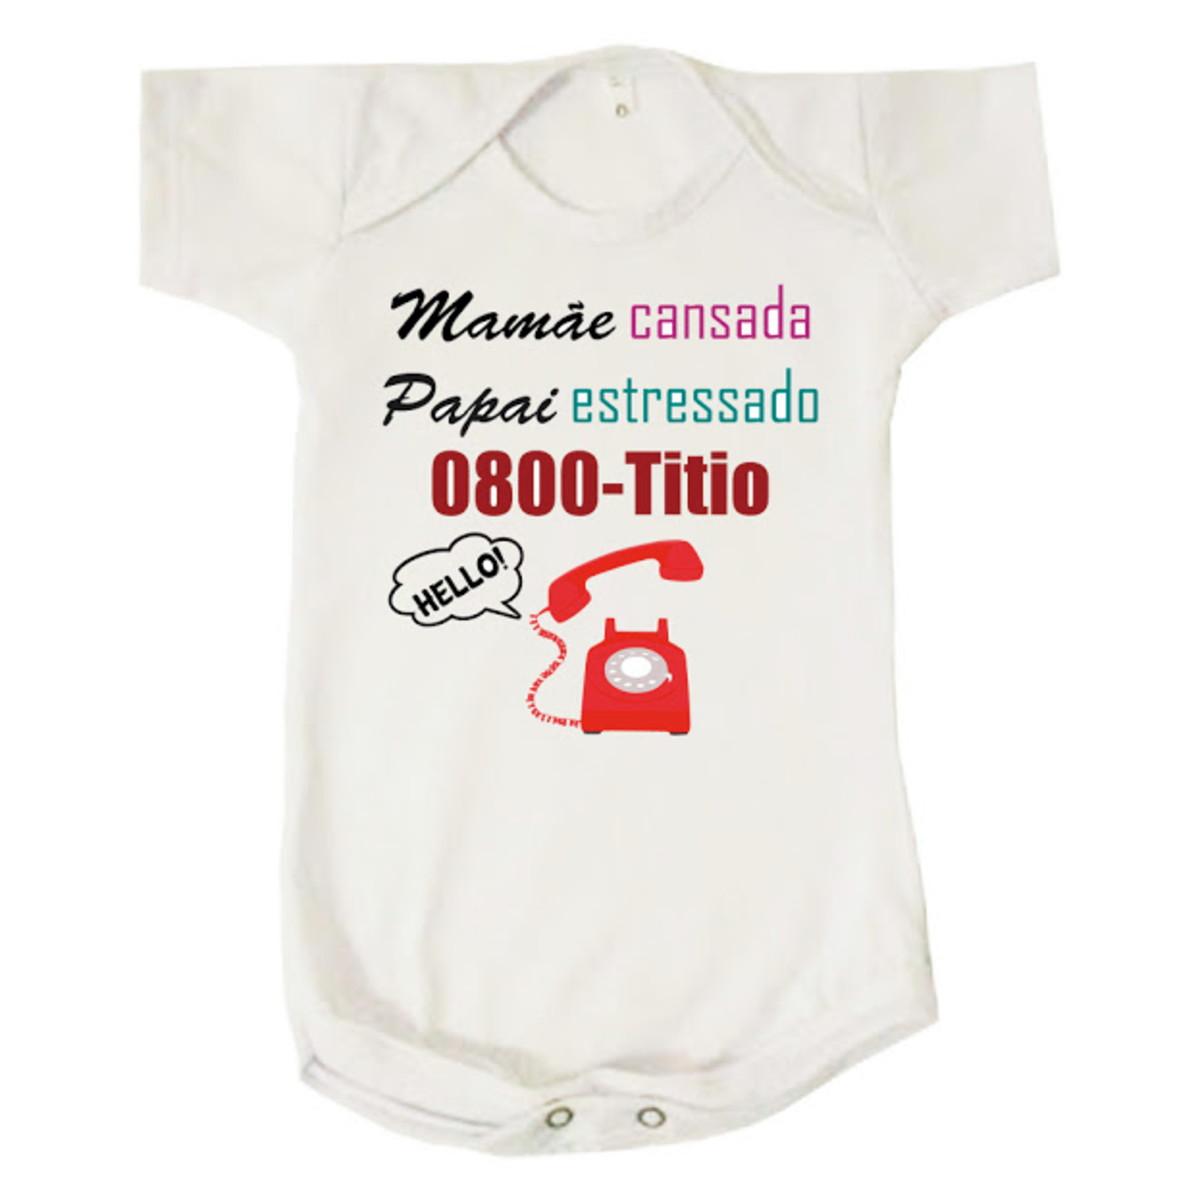 f62b17443 Body Bebê Infantil Mamãe Papai 0800 Titio Neutro no Elo7 | Loja ...